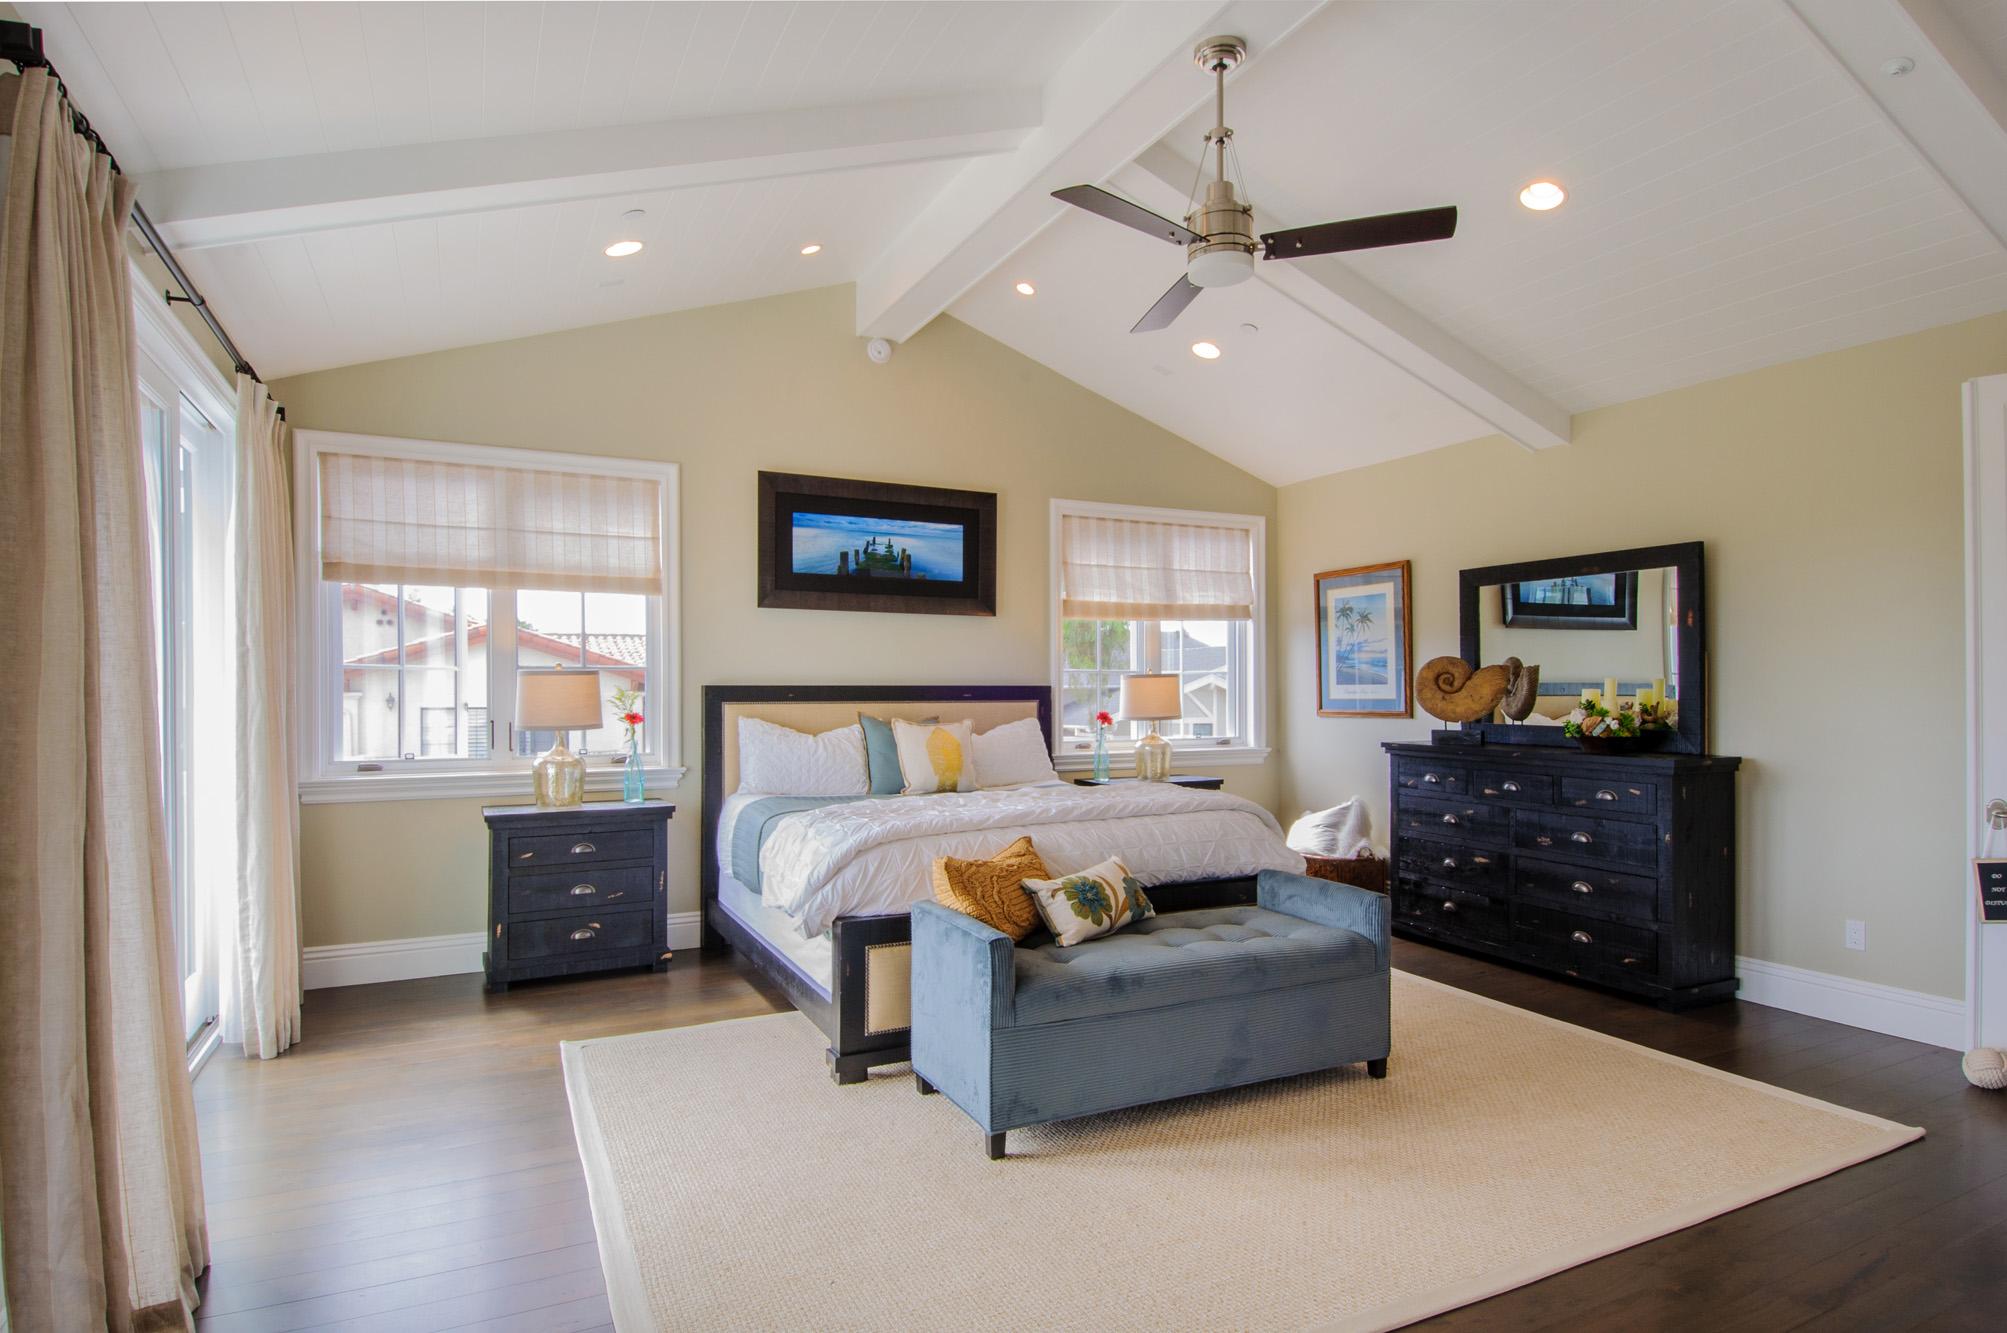 capecod - master bedroom - sisal rug.jpg